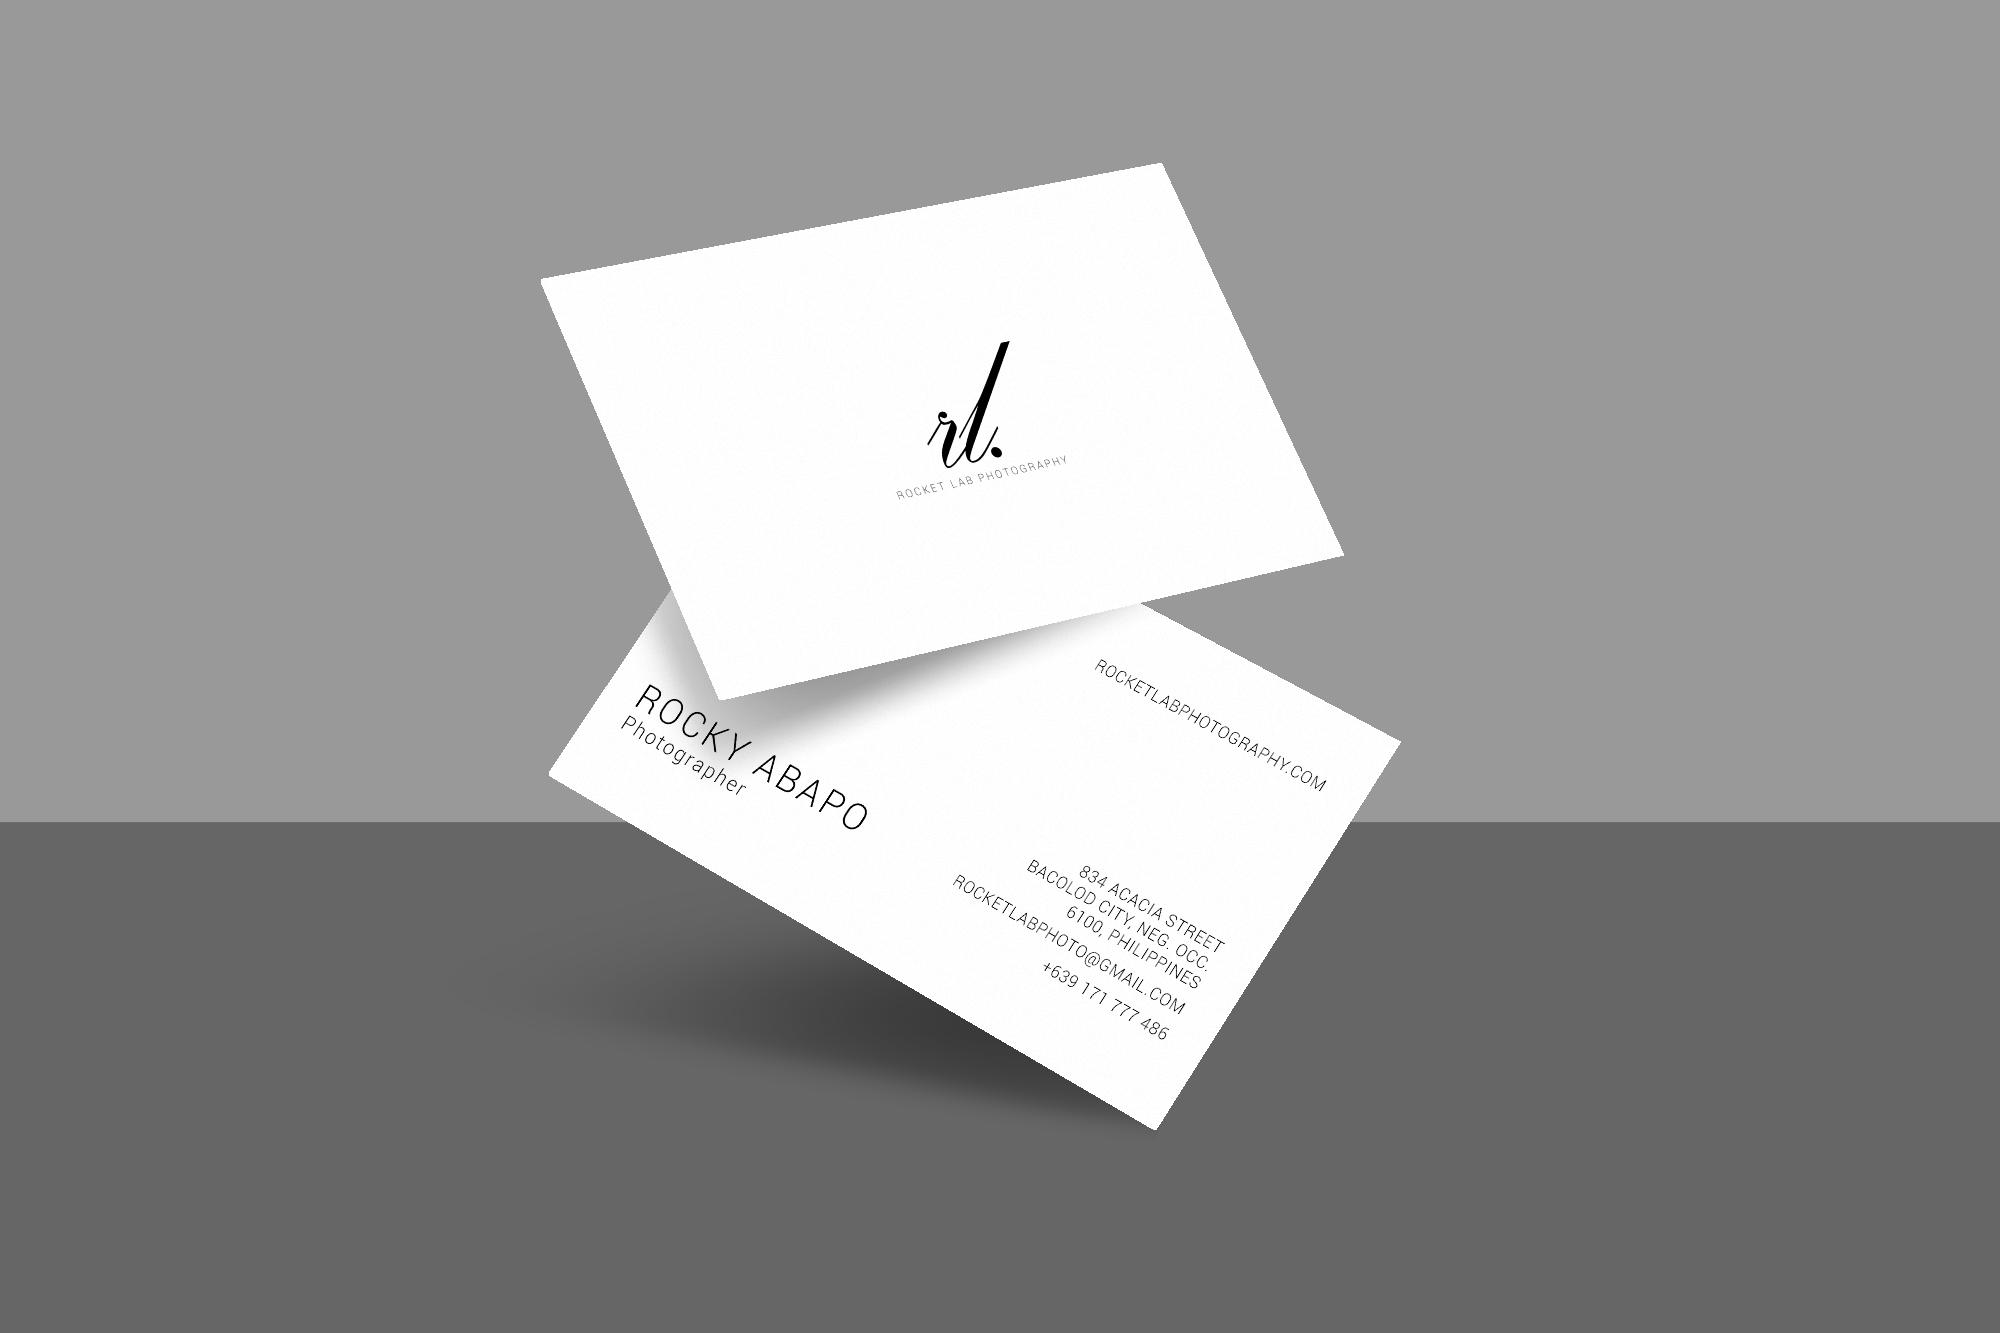 Minimal Business Card Design - Satisfaction Guaranteed